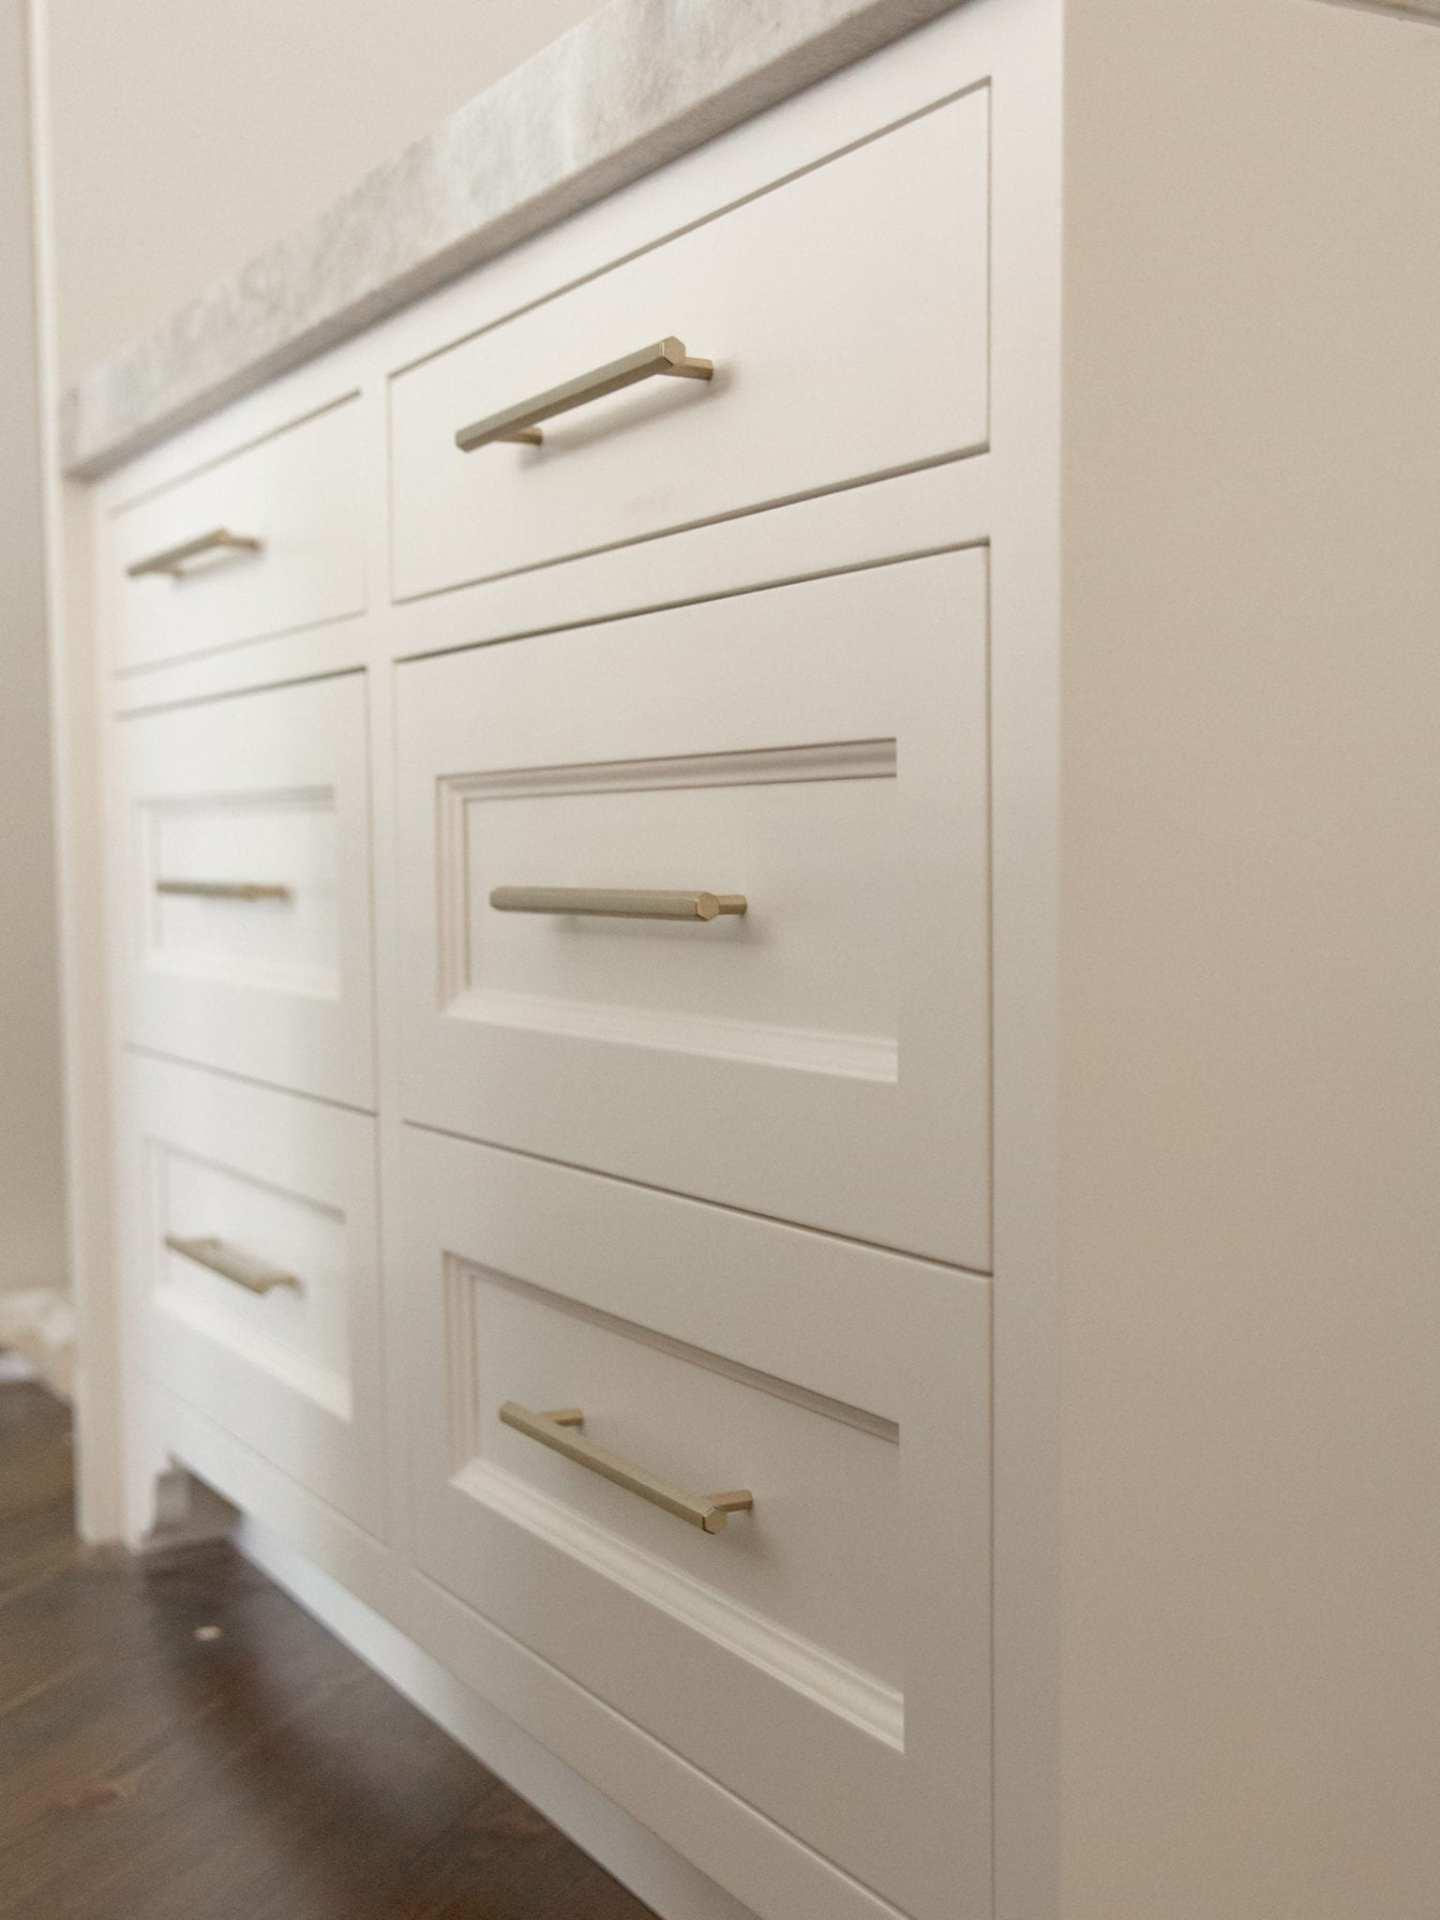 VESTA Bronze Pulls. Modern pulls for cabinetry.